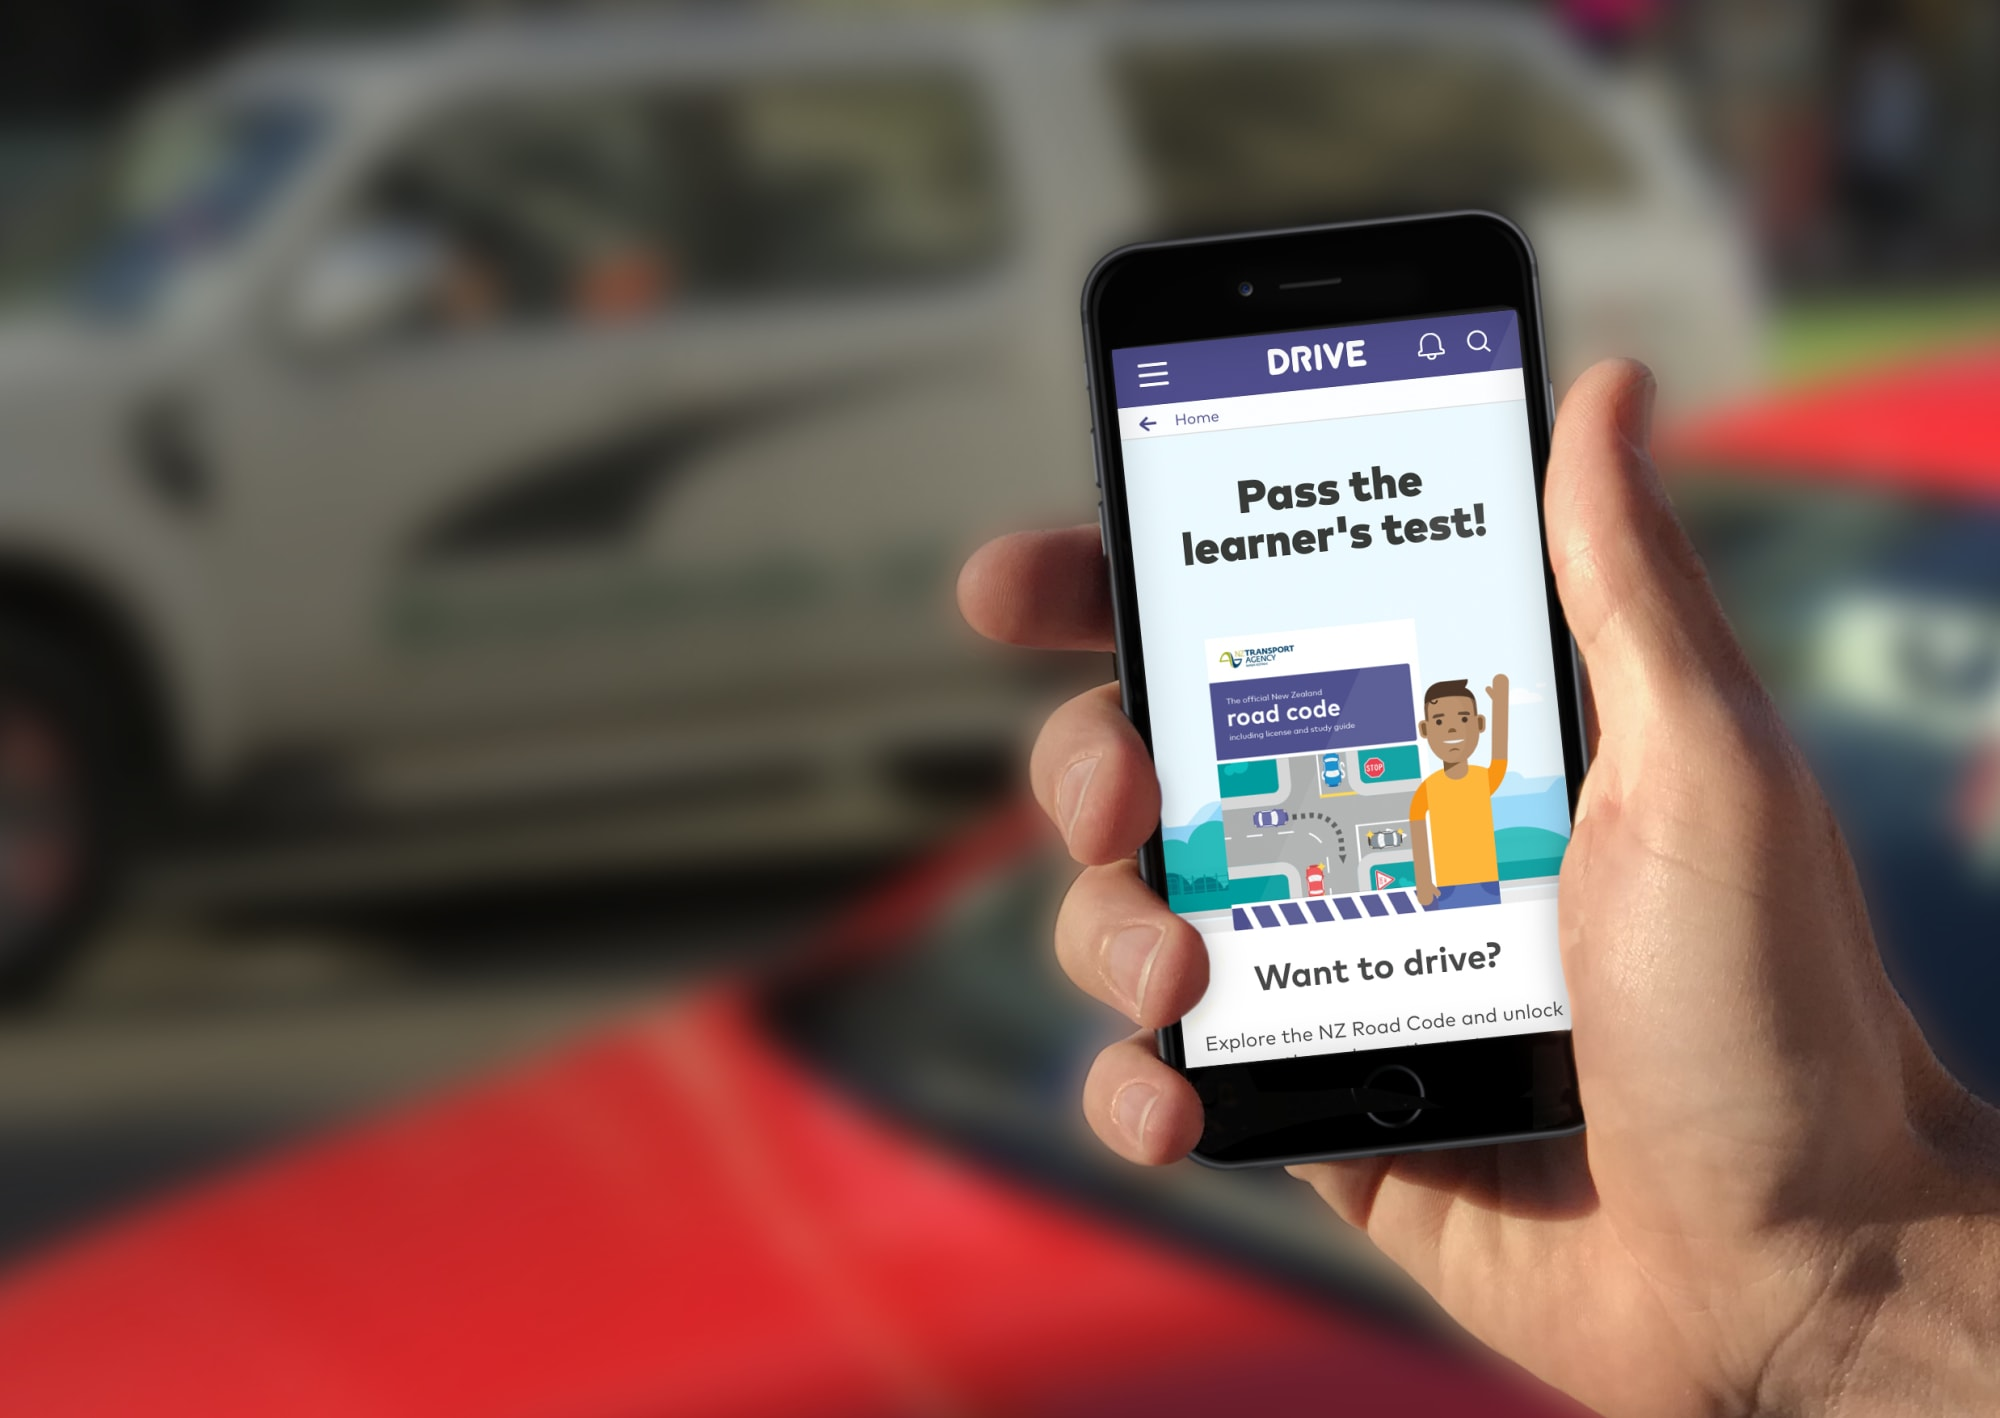 NZ Wellington WORK Drive Phone Mockup